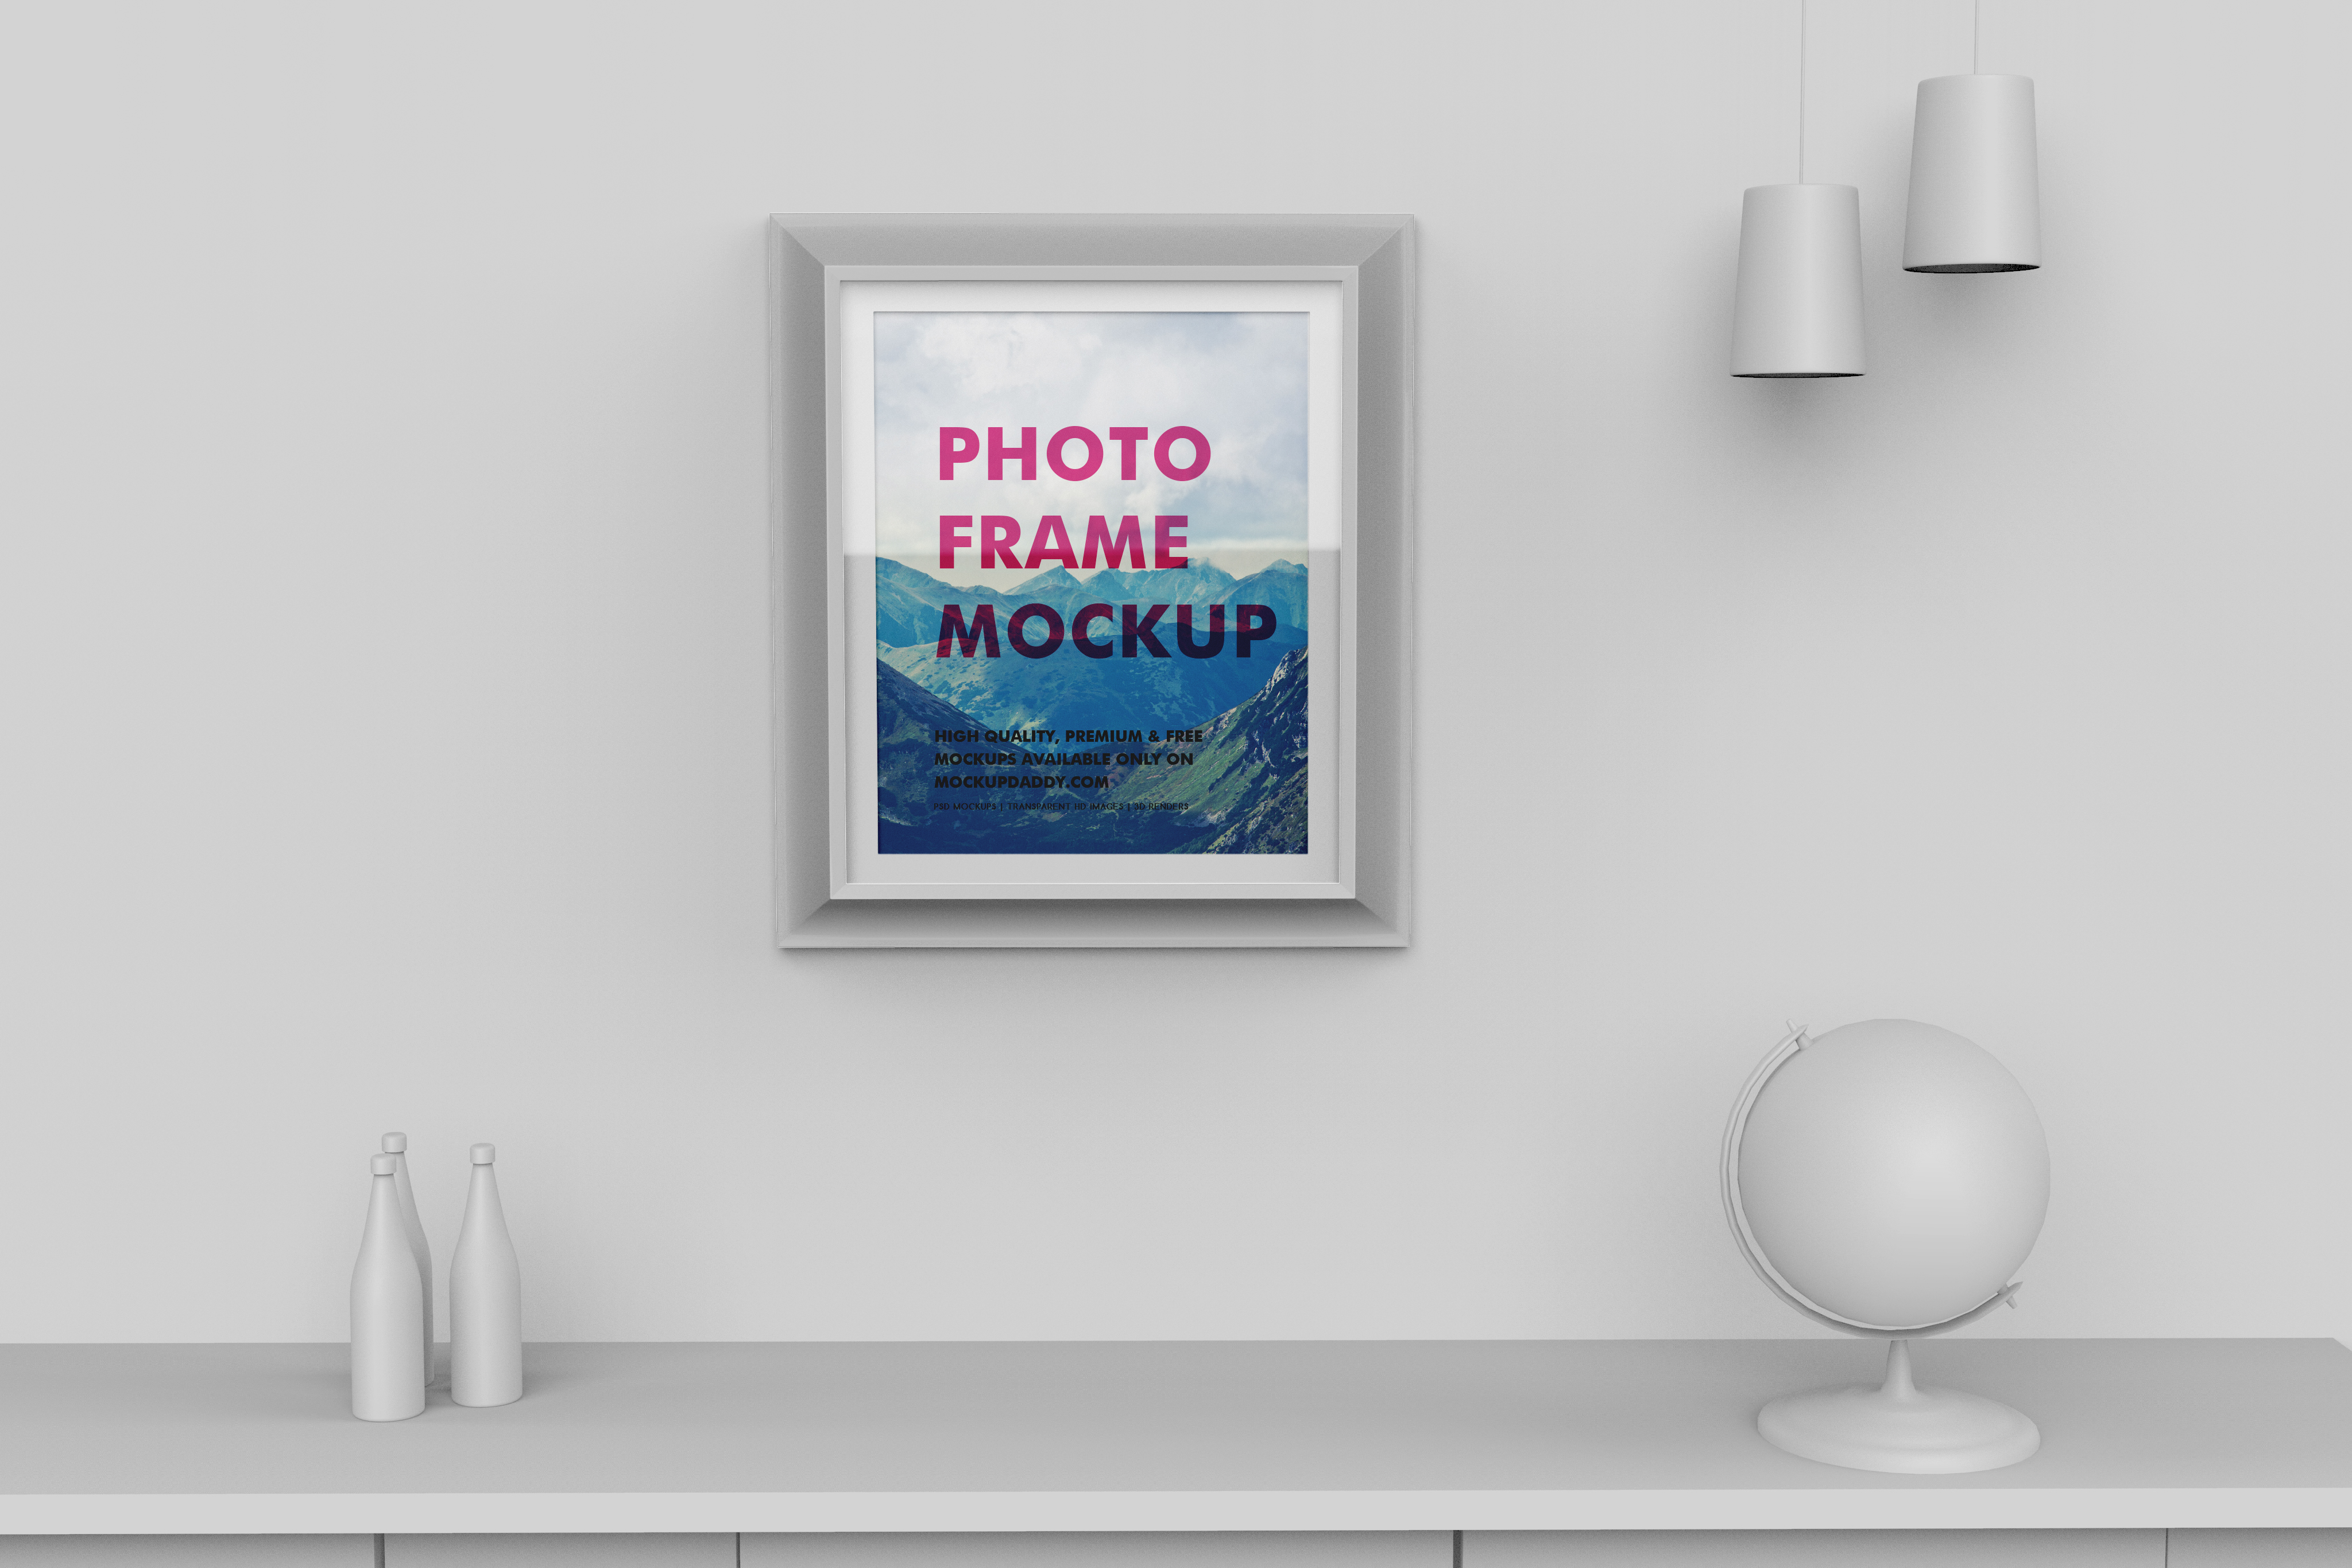 Photo Frame Mockup Free Download - Premium Branding Mockups